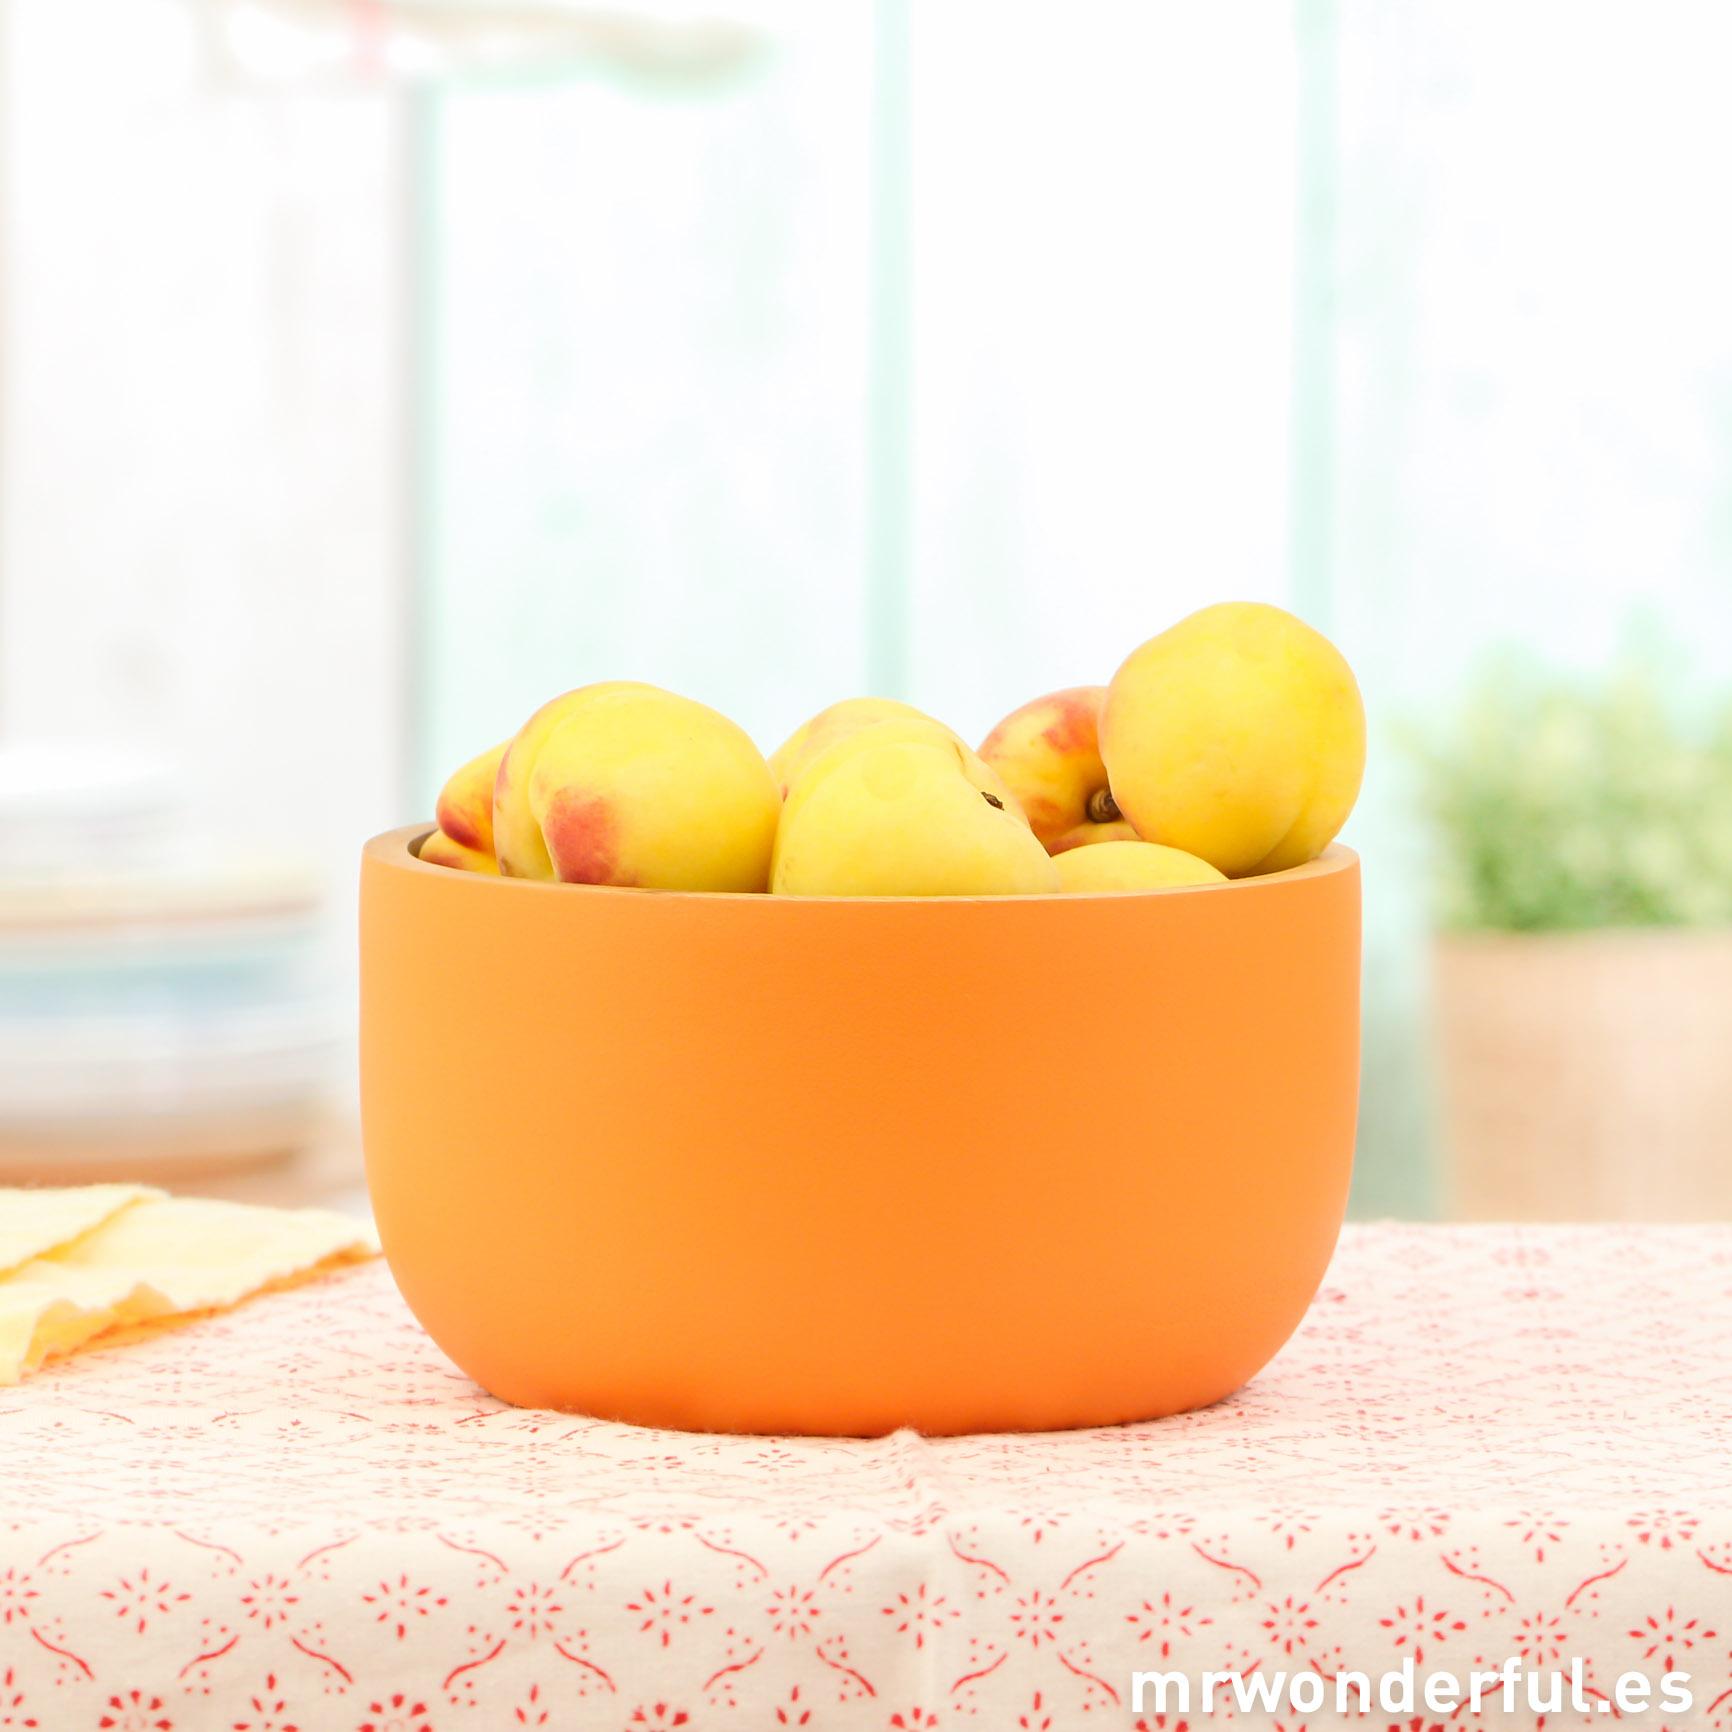 mrwonderful_067760_bol-grande-madera-naranja-2